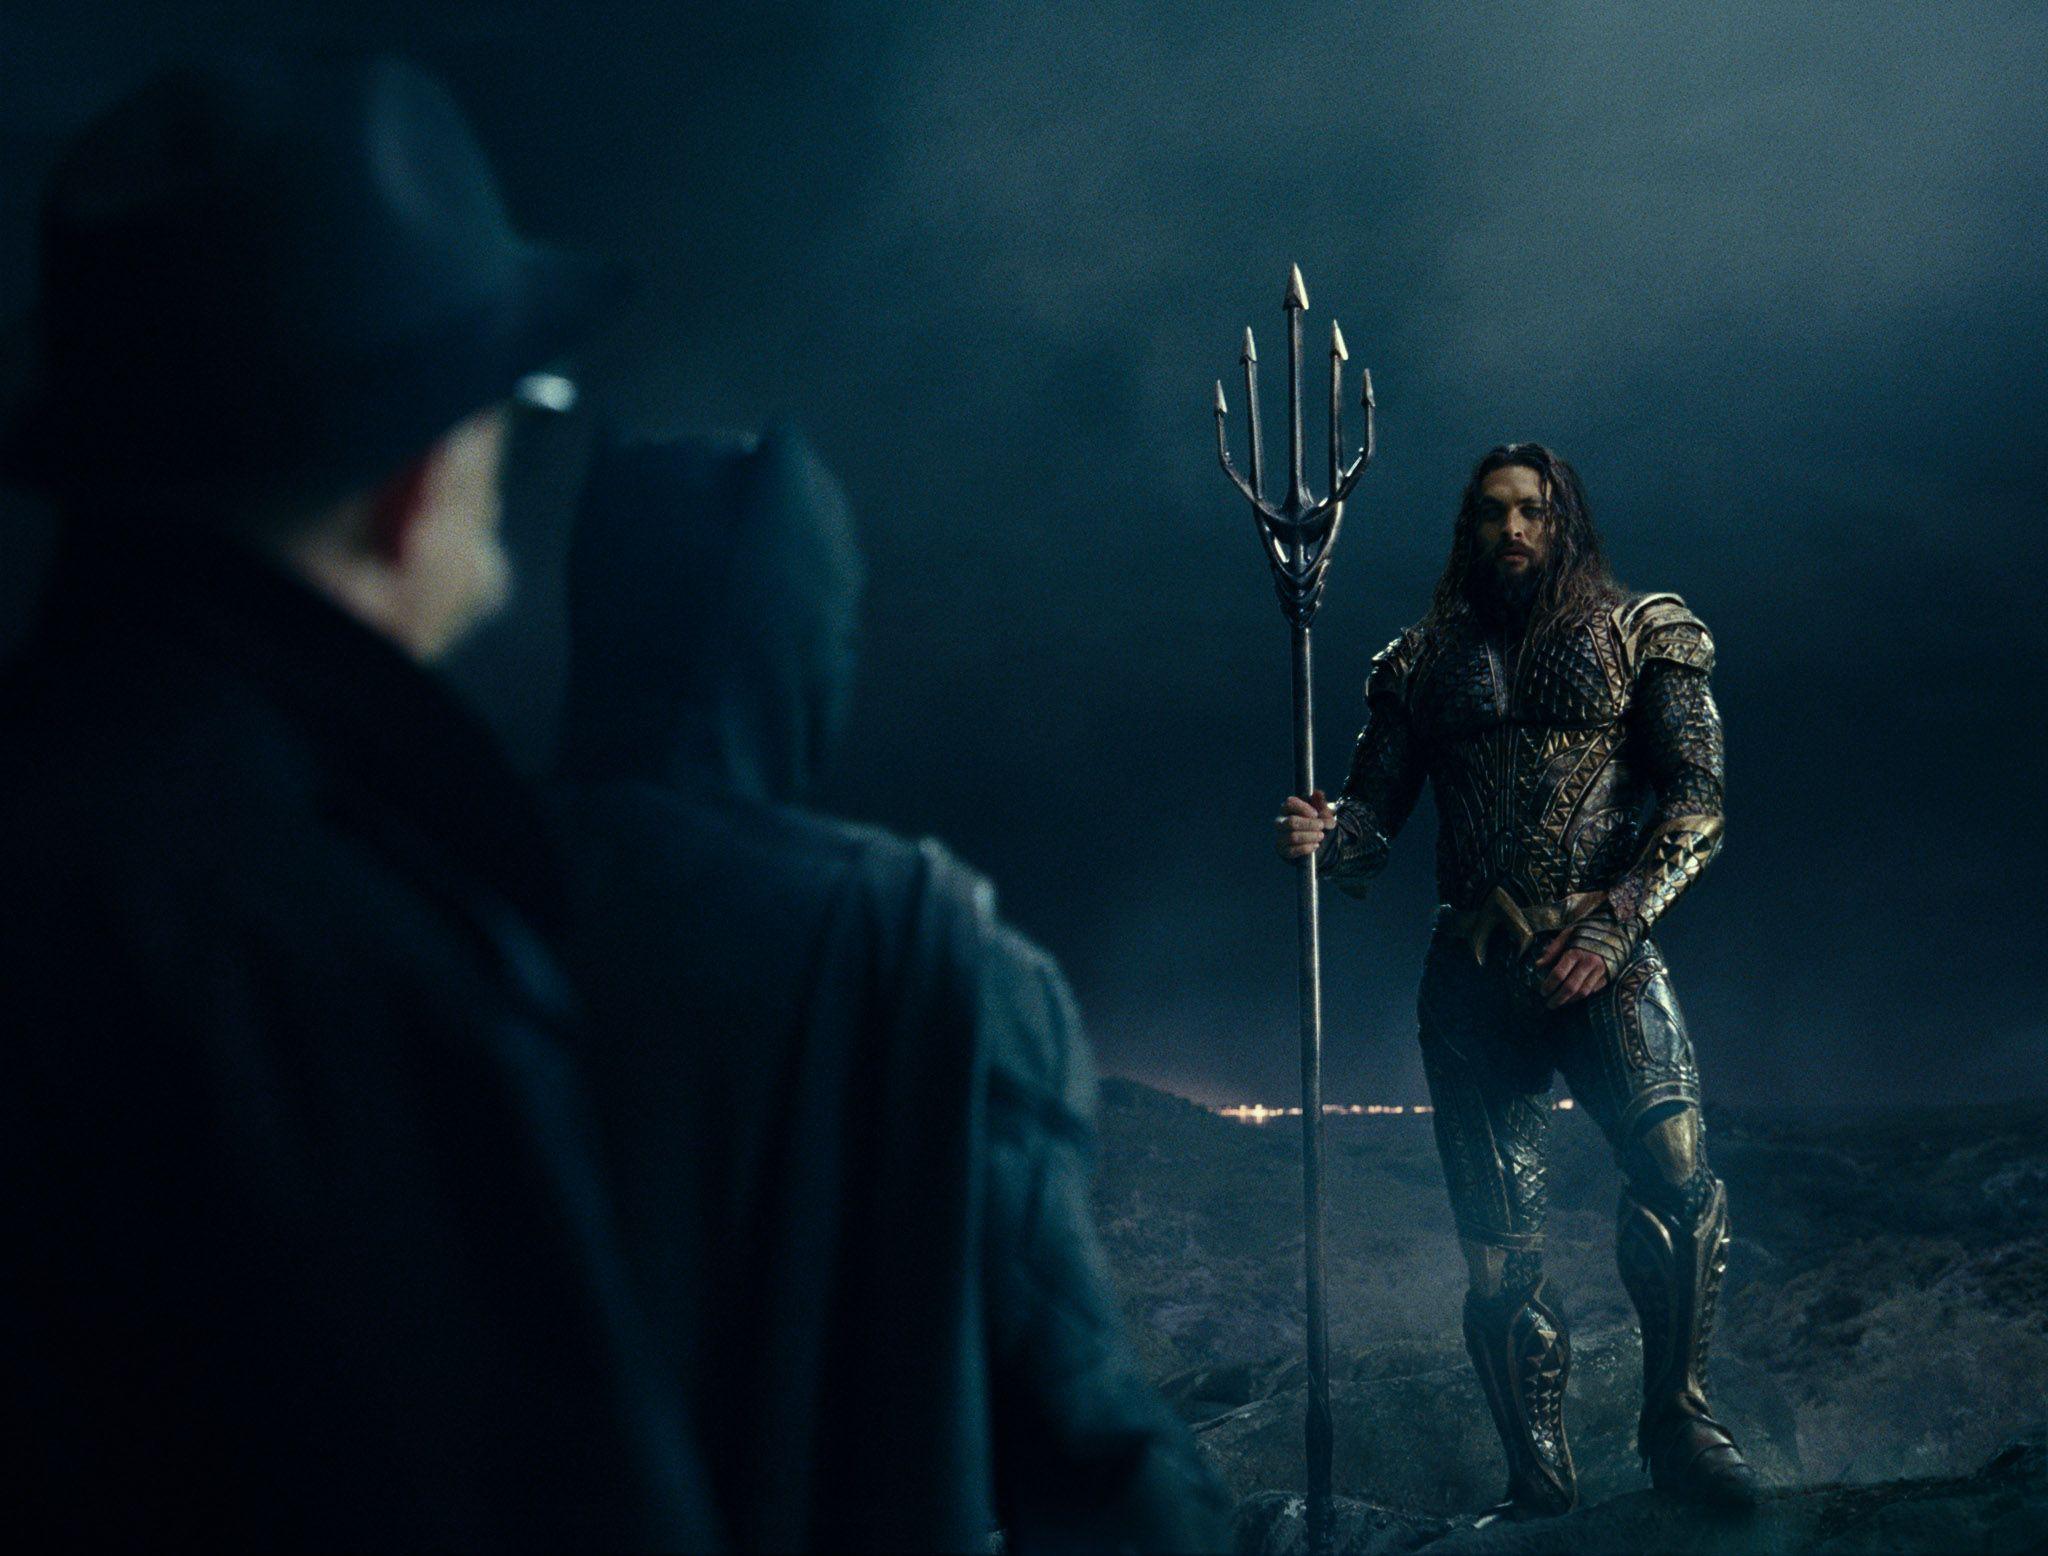 Aquaman release date trailer